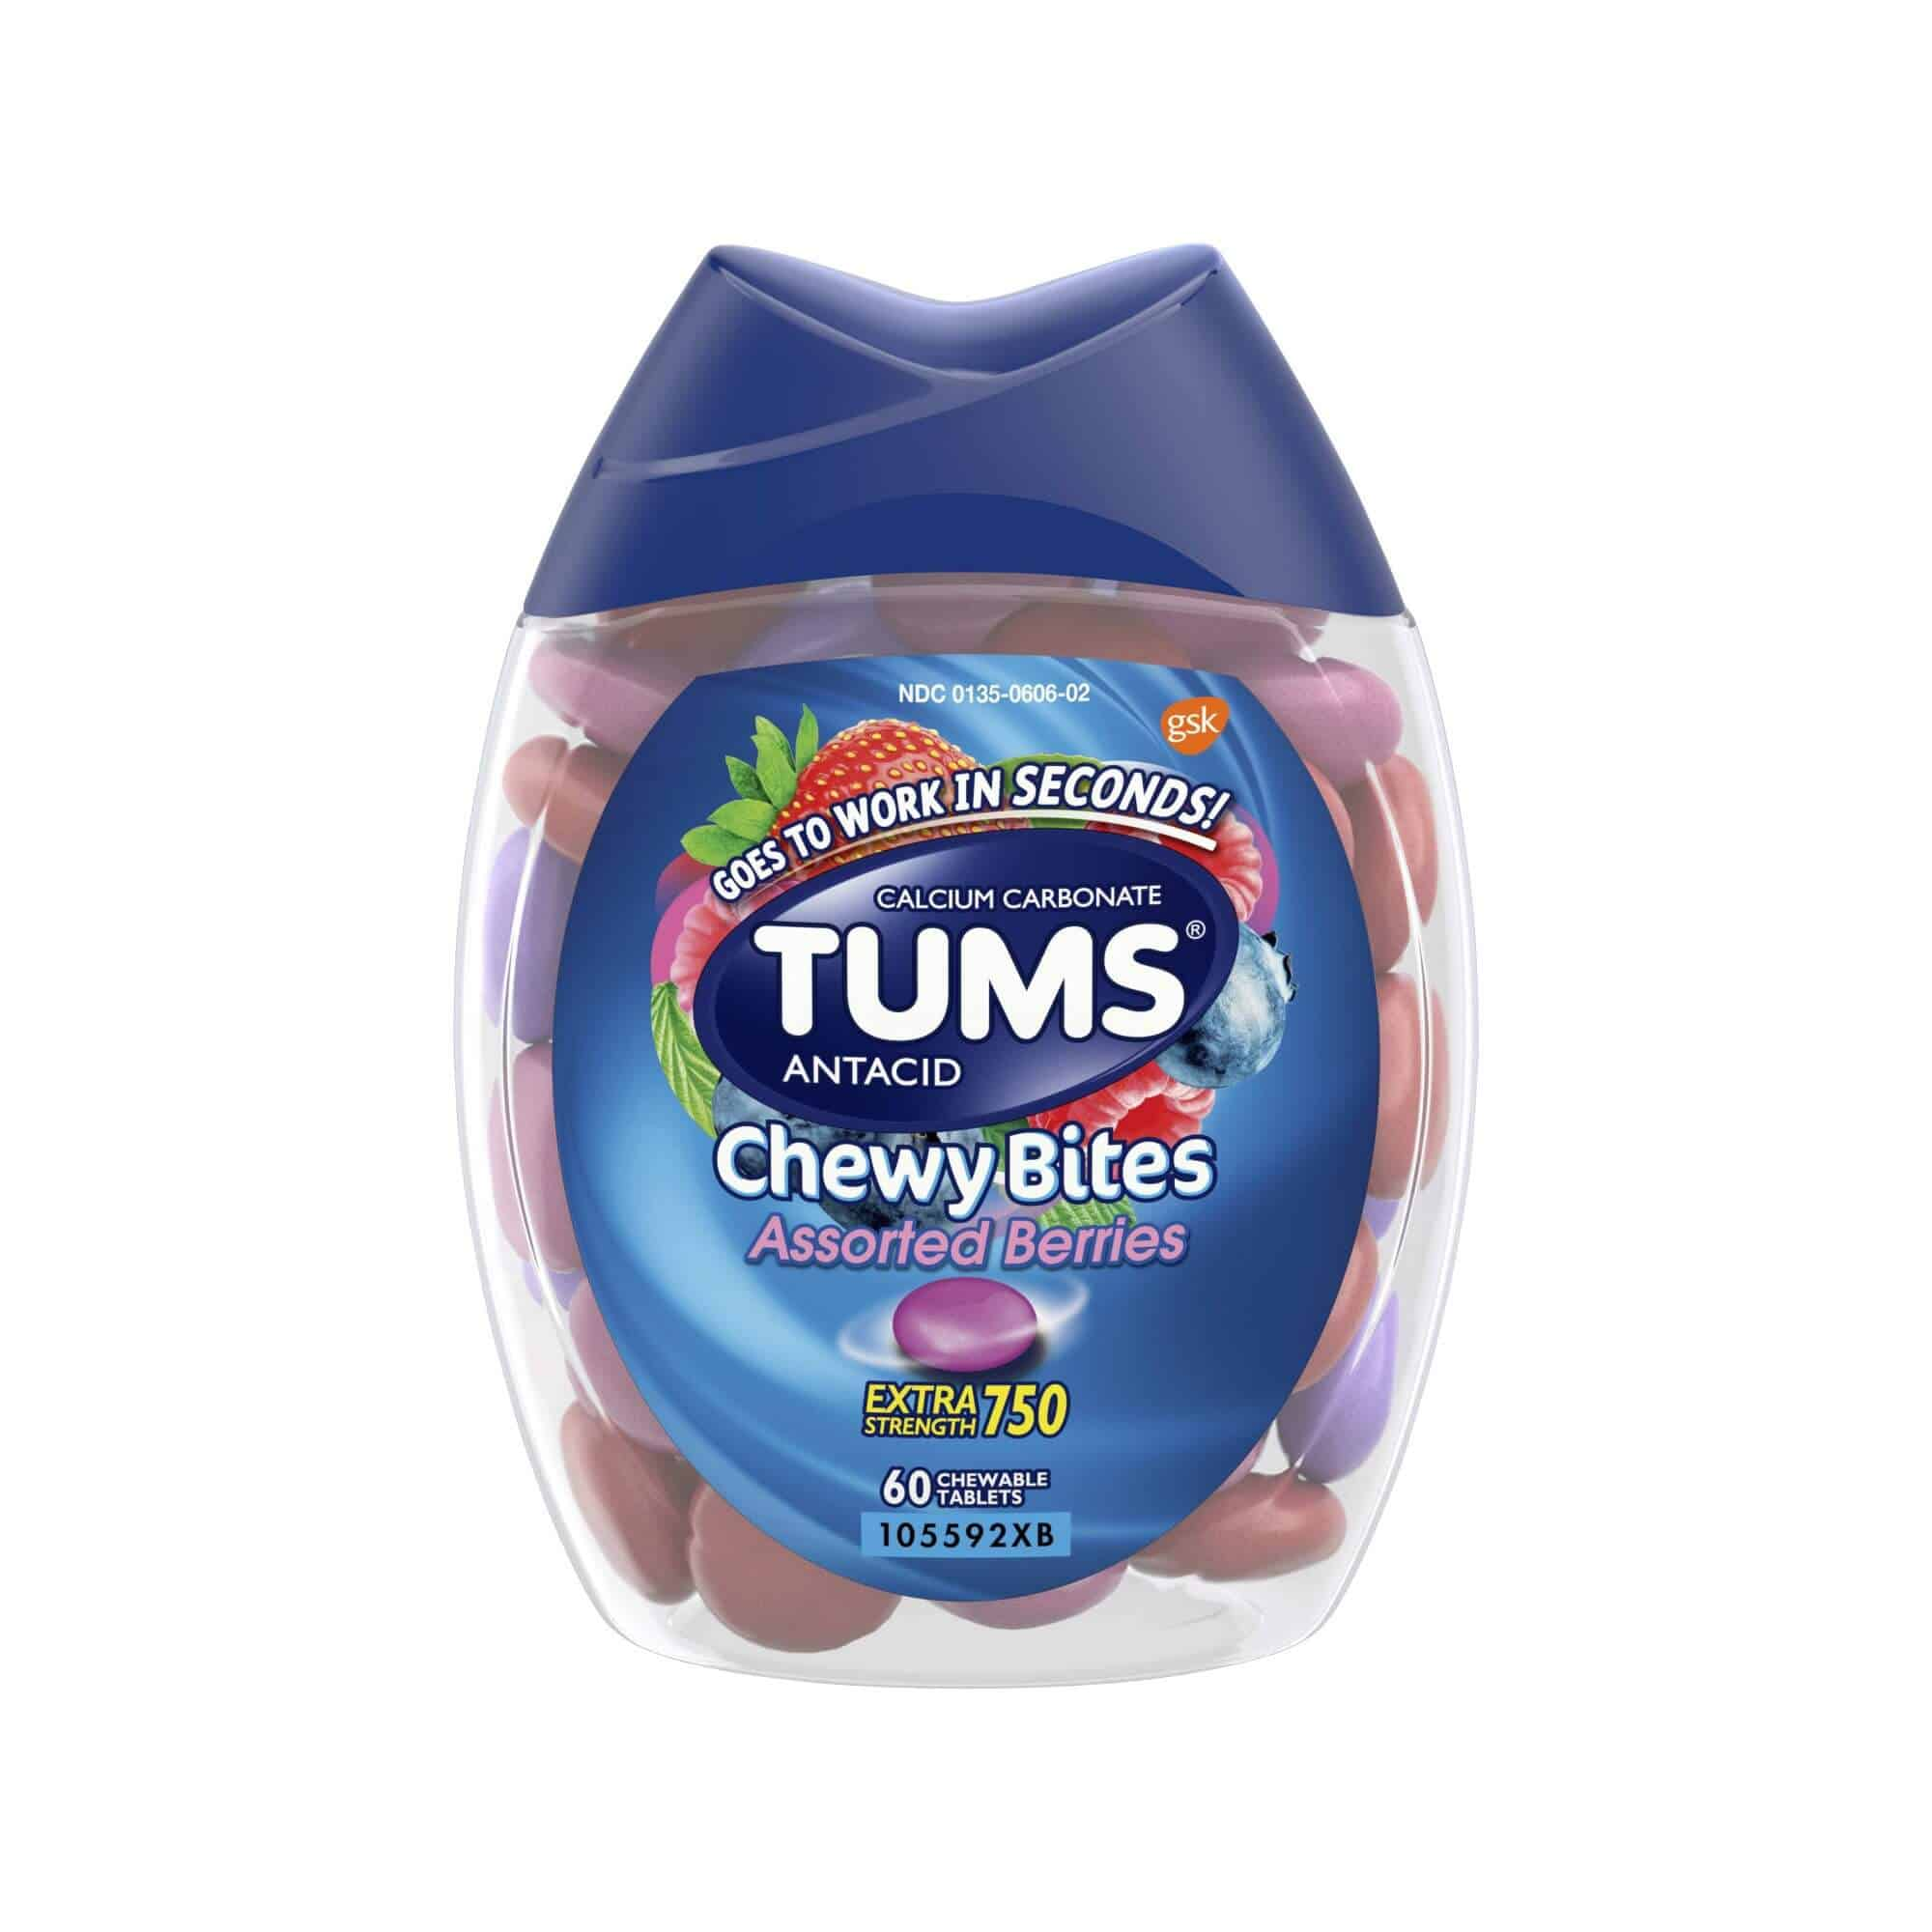 photo regarding Tums Printable Coupon known as $1.50 off any (1) Tums Chewy Bites Printable Coupon